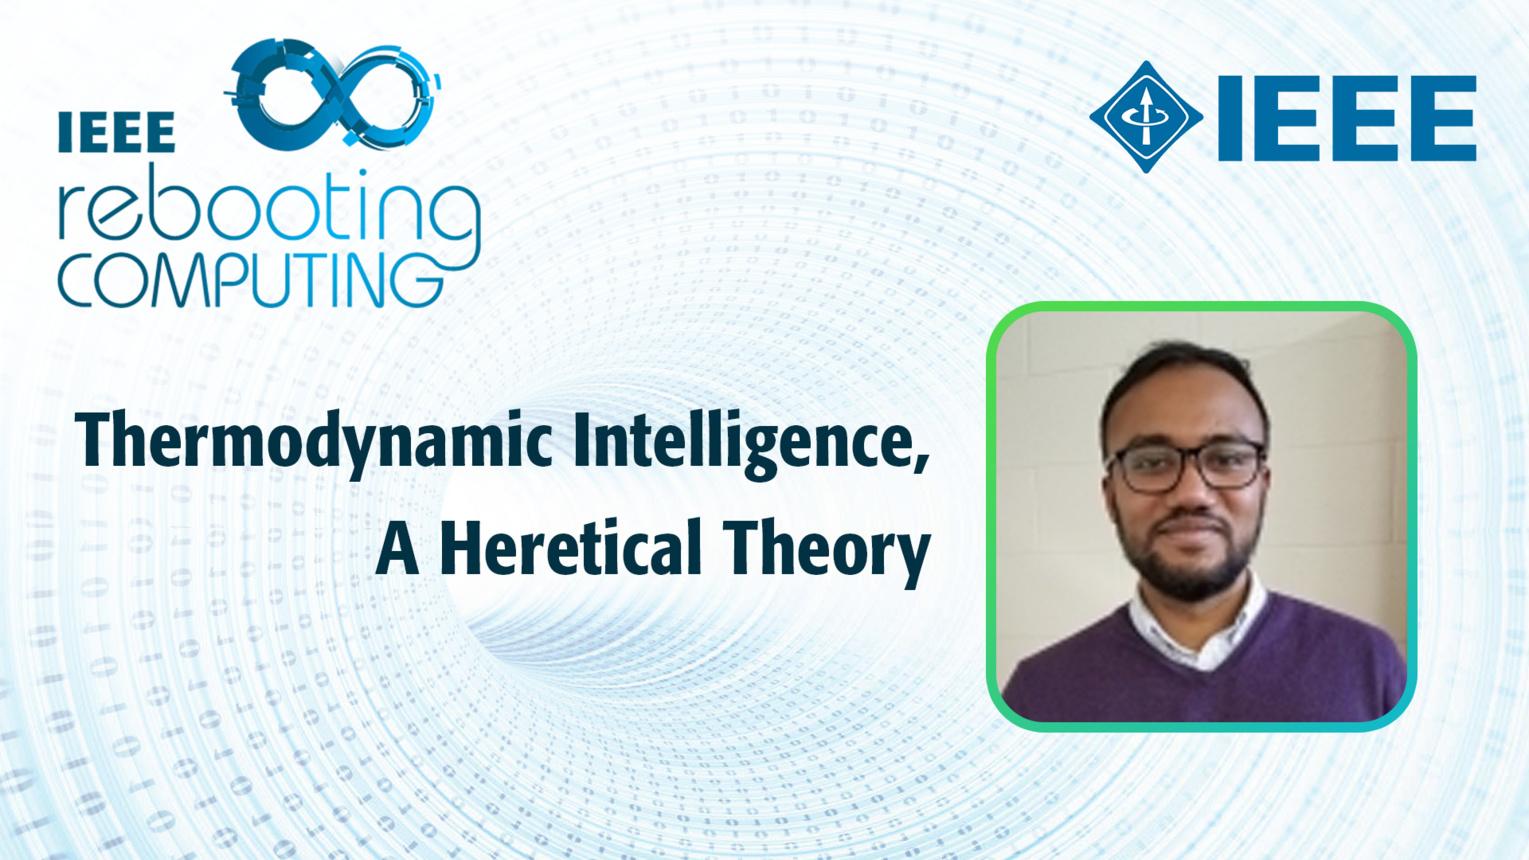 Thermodynamic Intelligence, A Heretical Theory - Natesh Ganesh - ICRC 2018